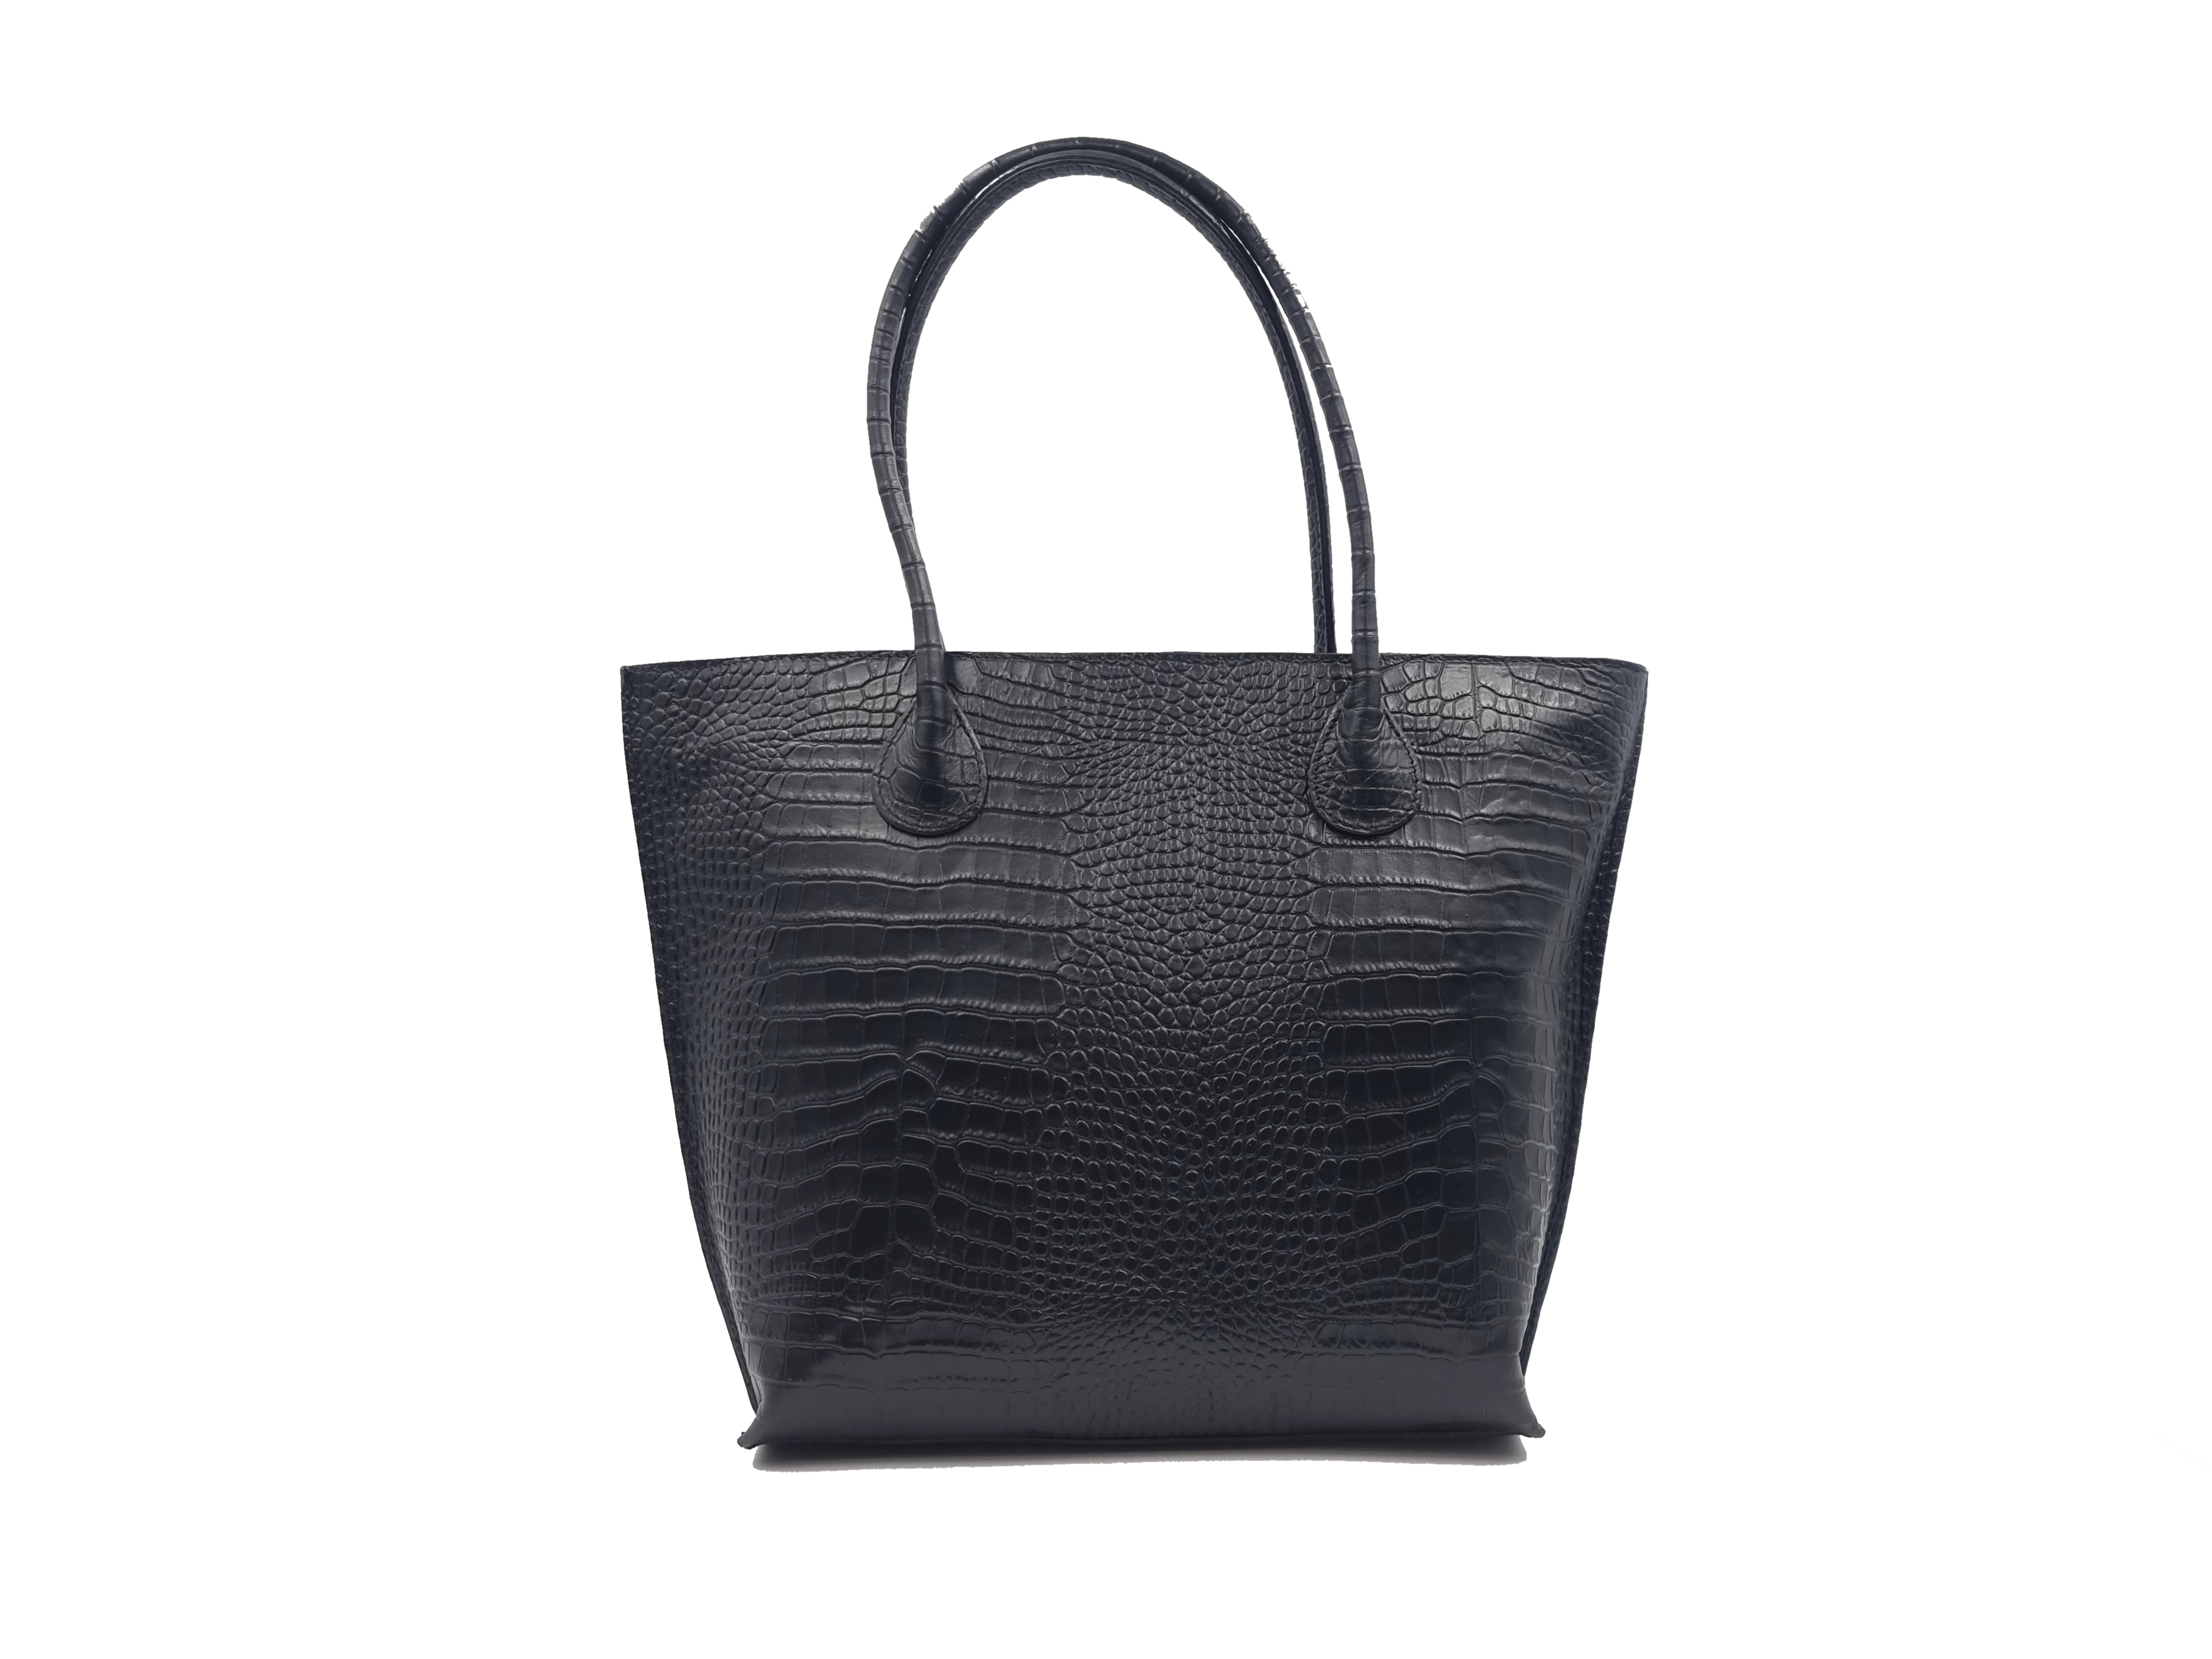 Kožená kabelka LOLO černá kroko